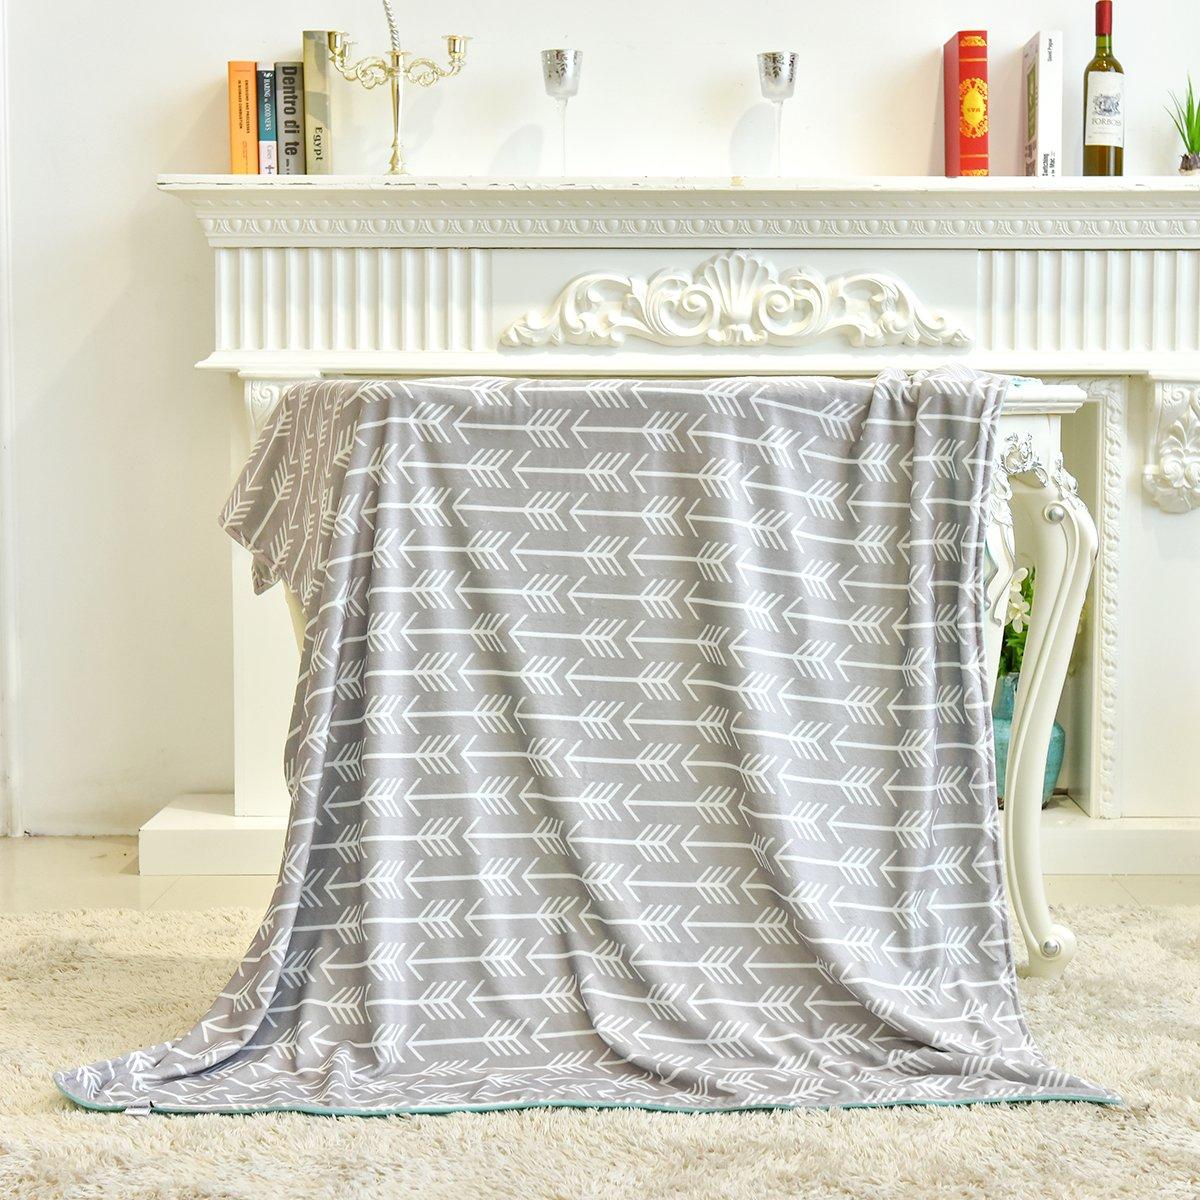 Towin Baby Double Layer Minky Throw Blanket/Bed Blanket/Couch Blanket, Mint 50x60 by TOWIN BABY